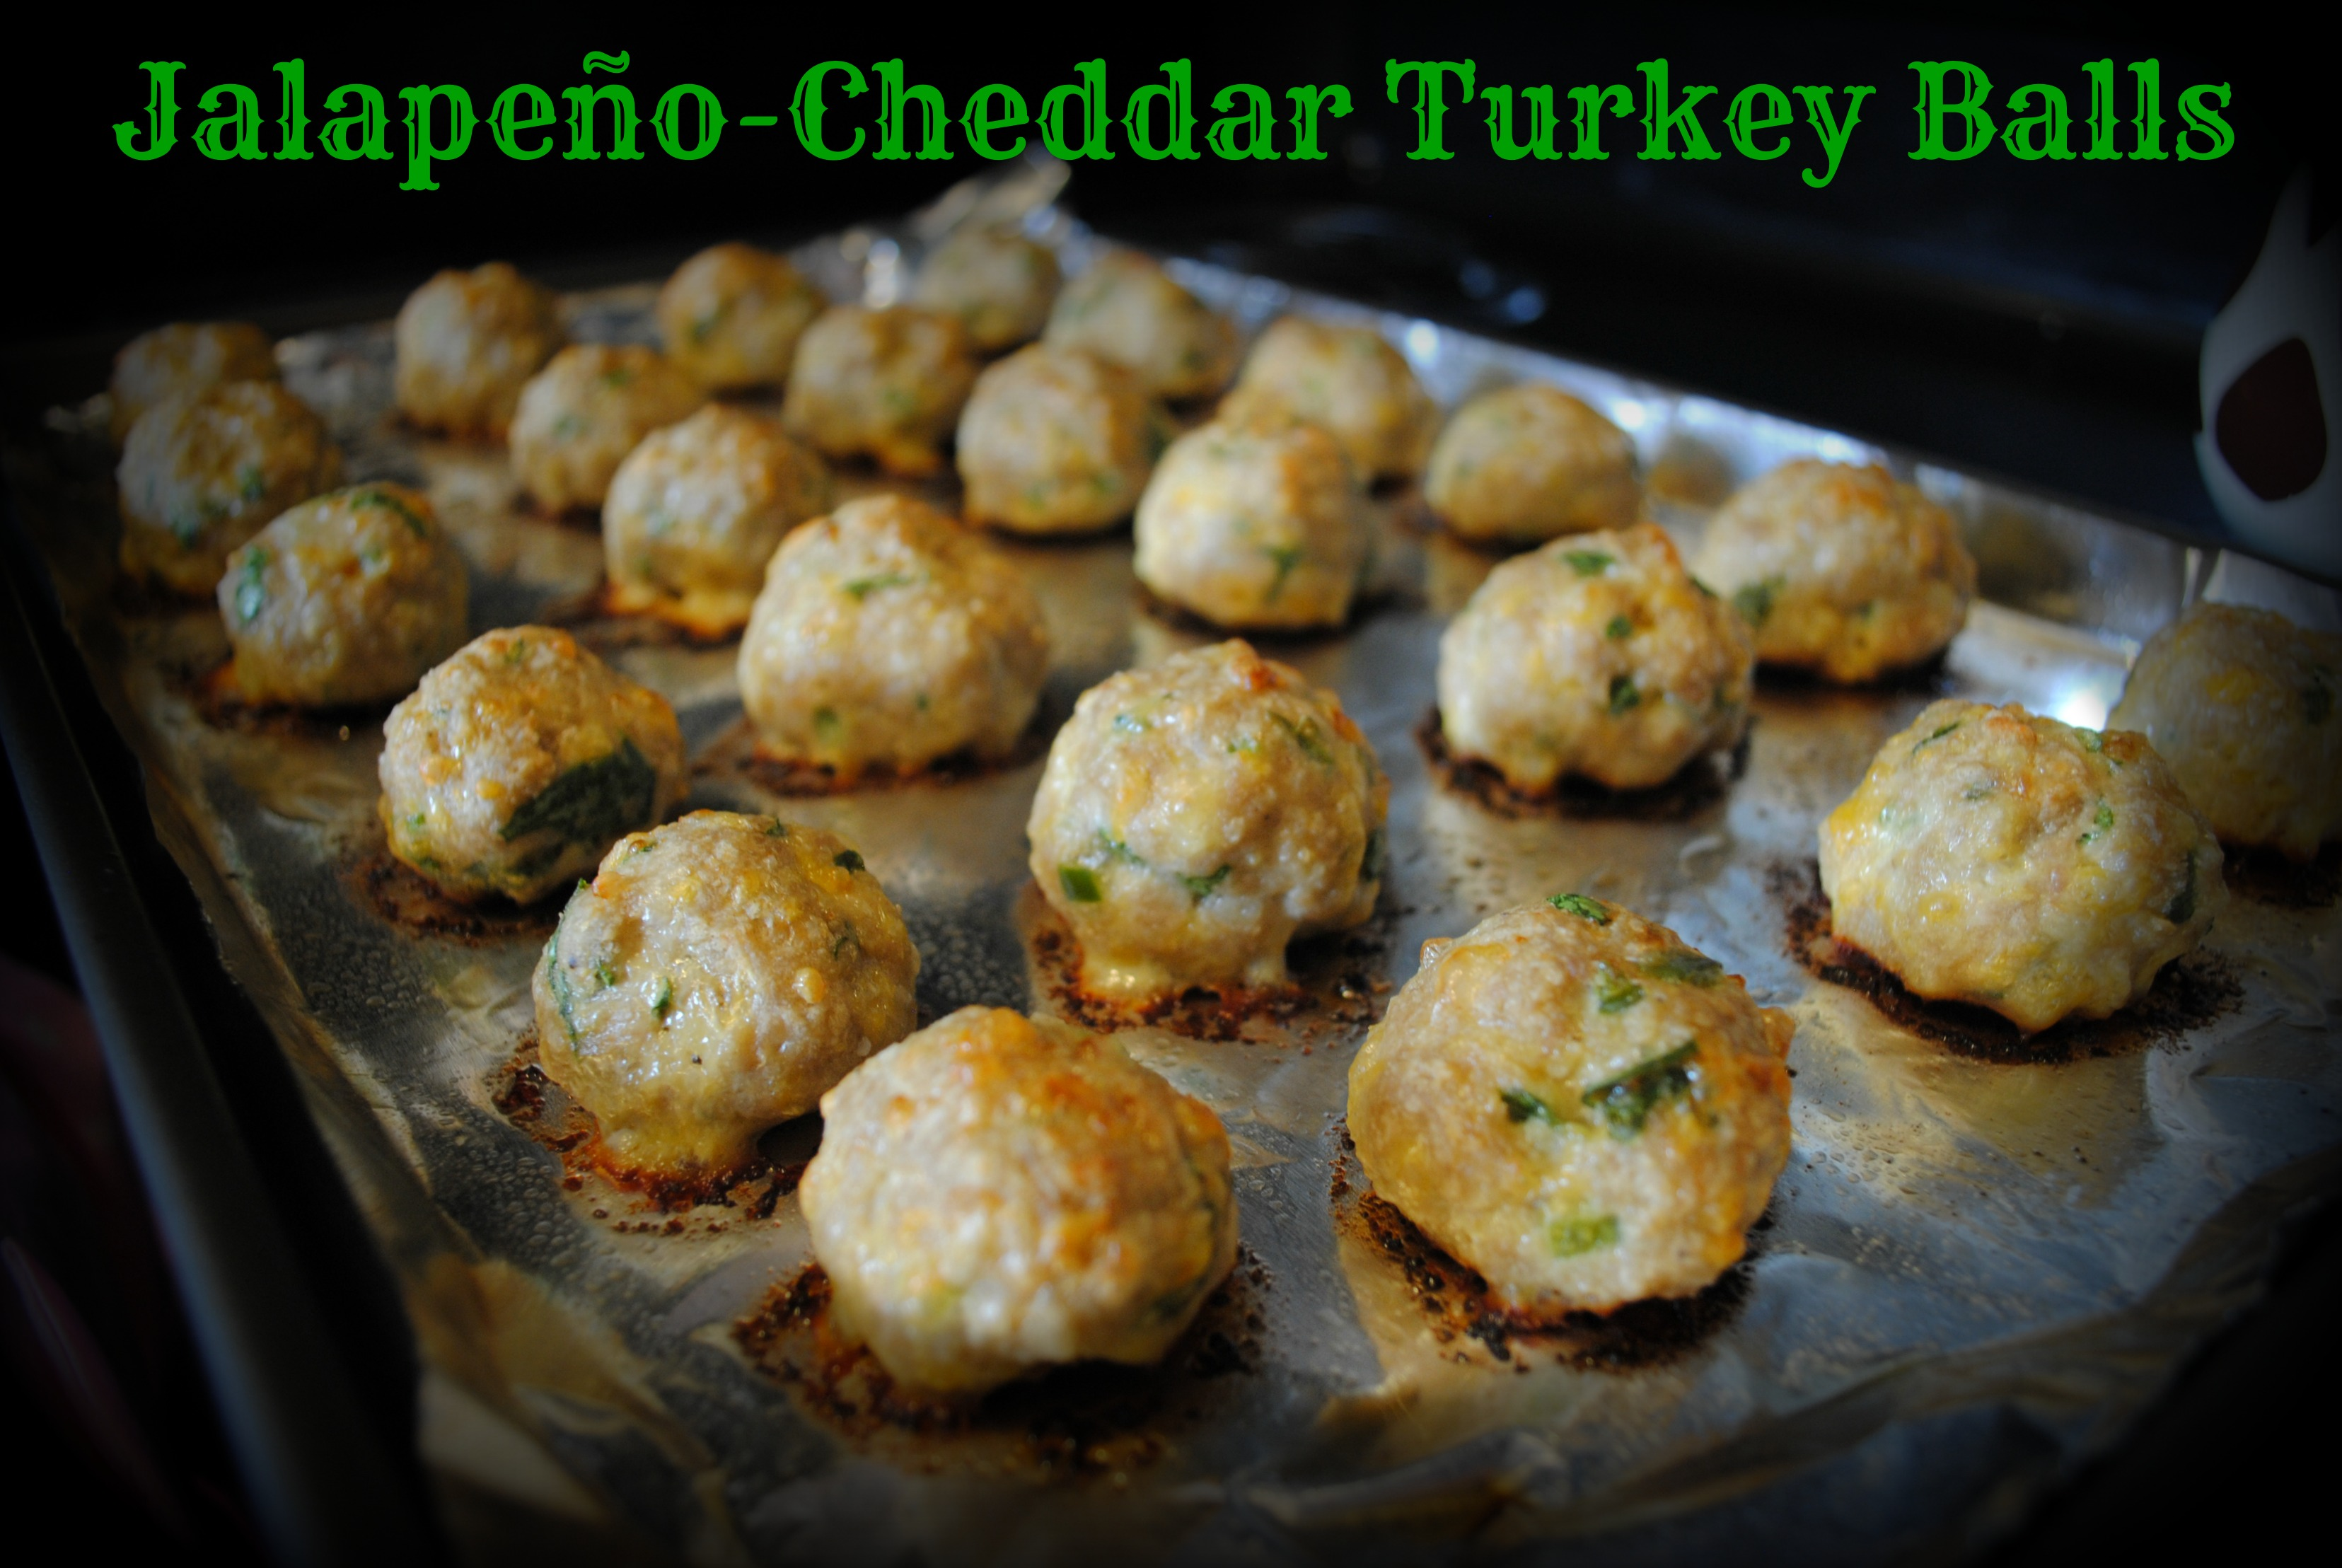 Jalapeno-Cheddar Turkey Balls